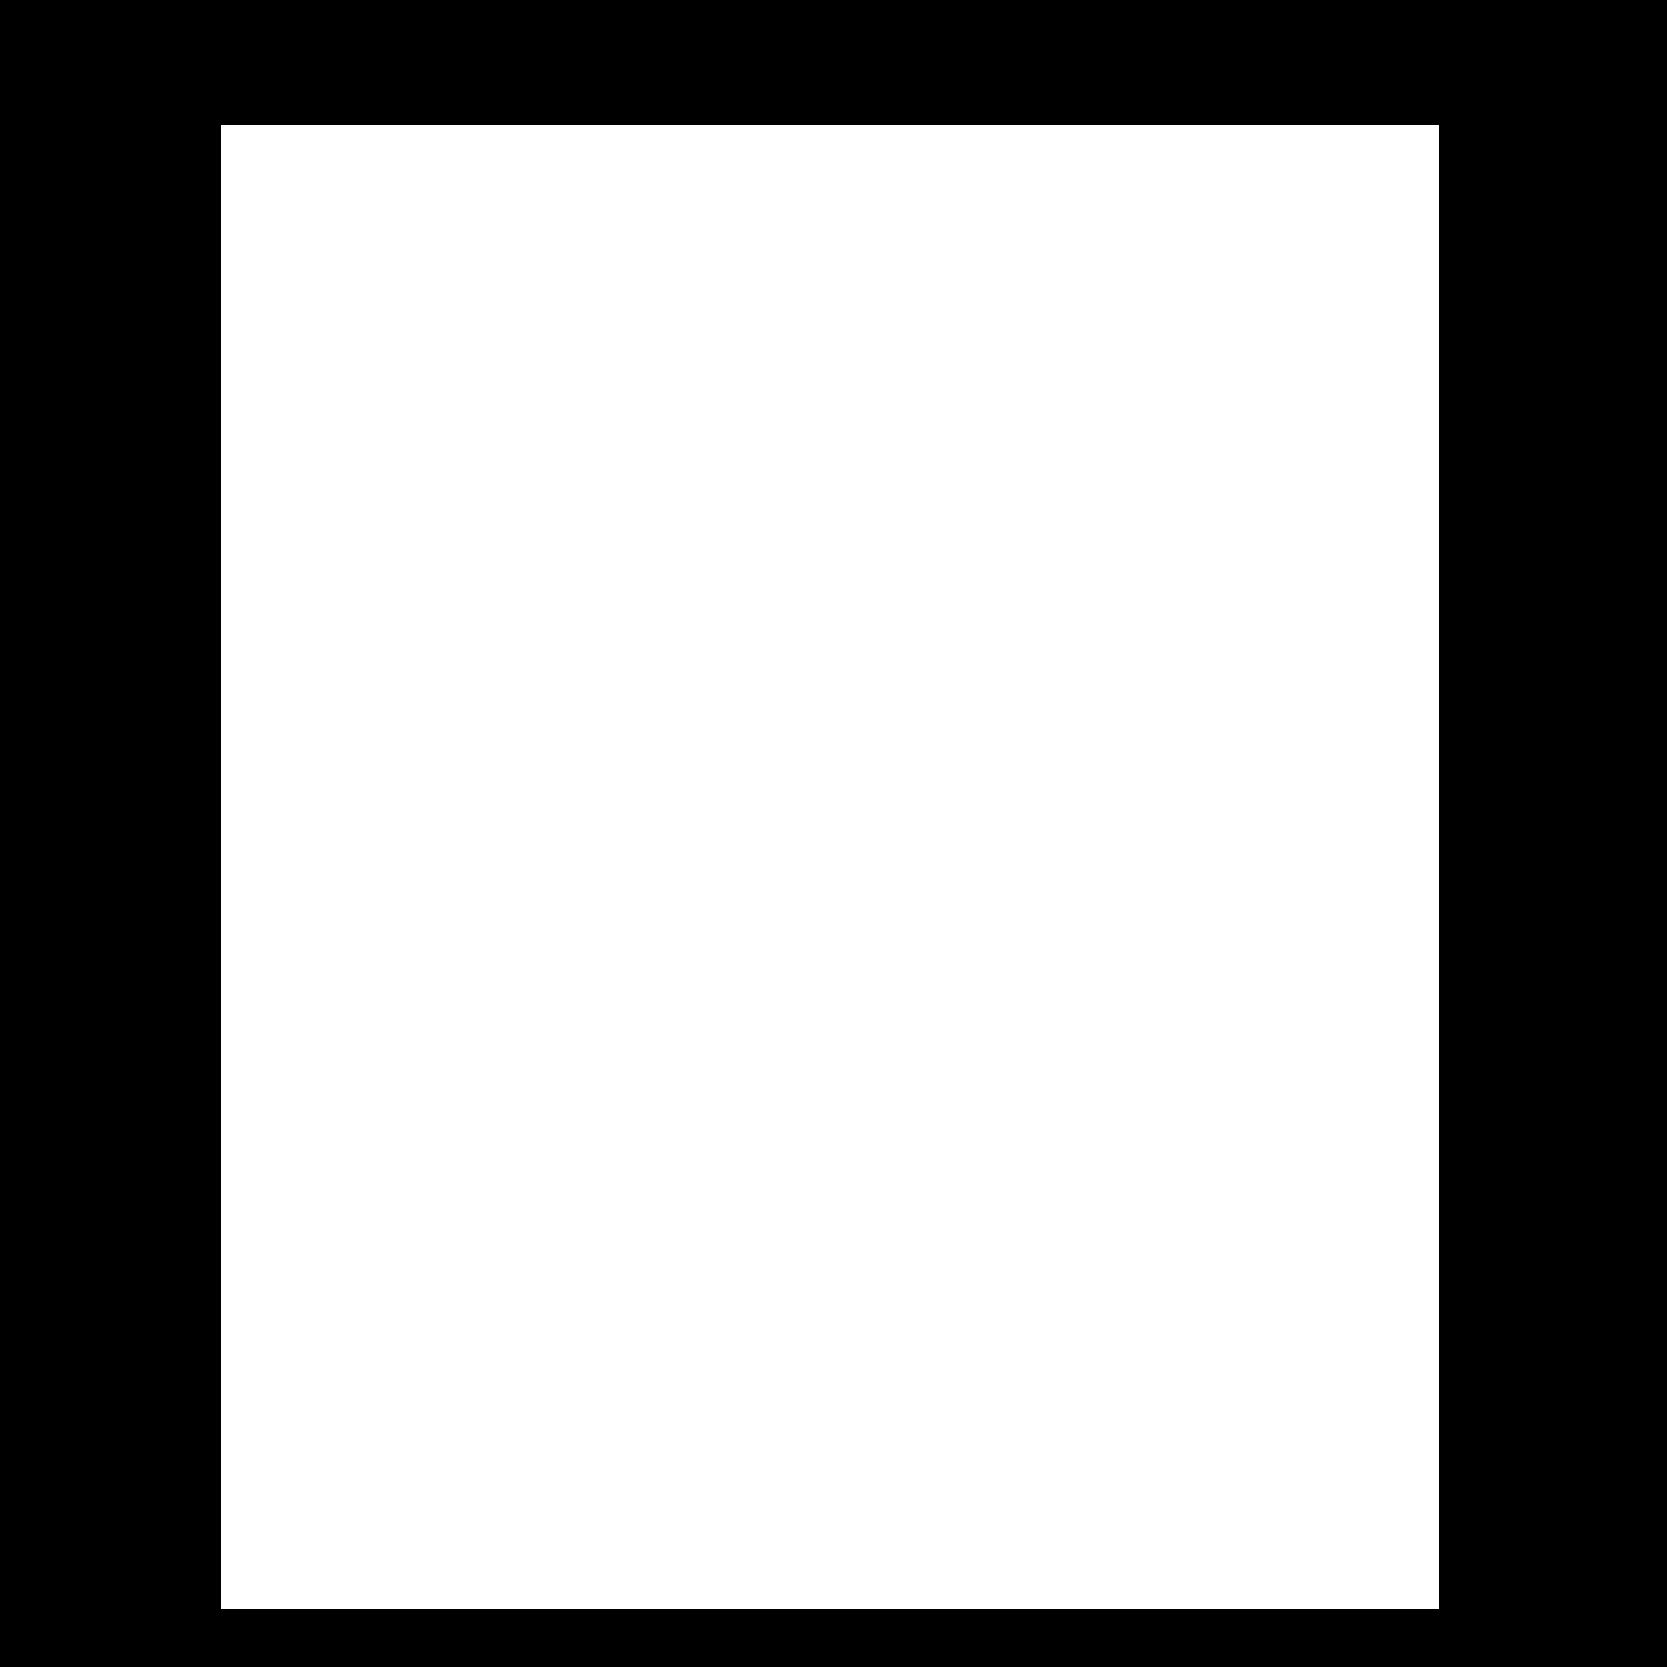 Enterprise teamraum®